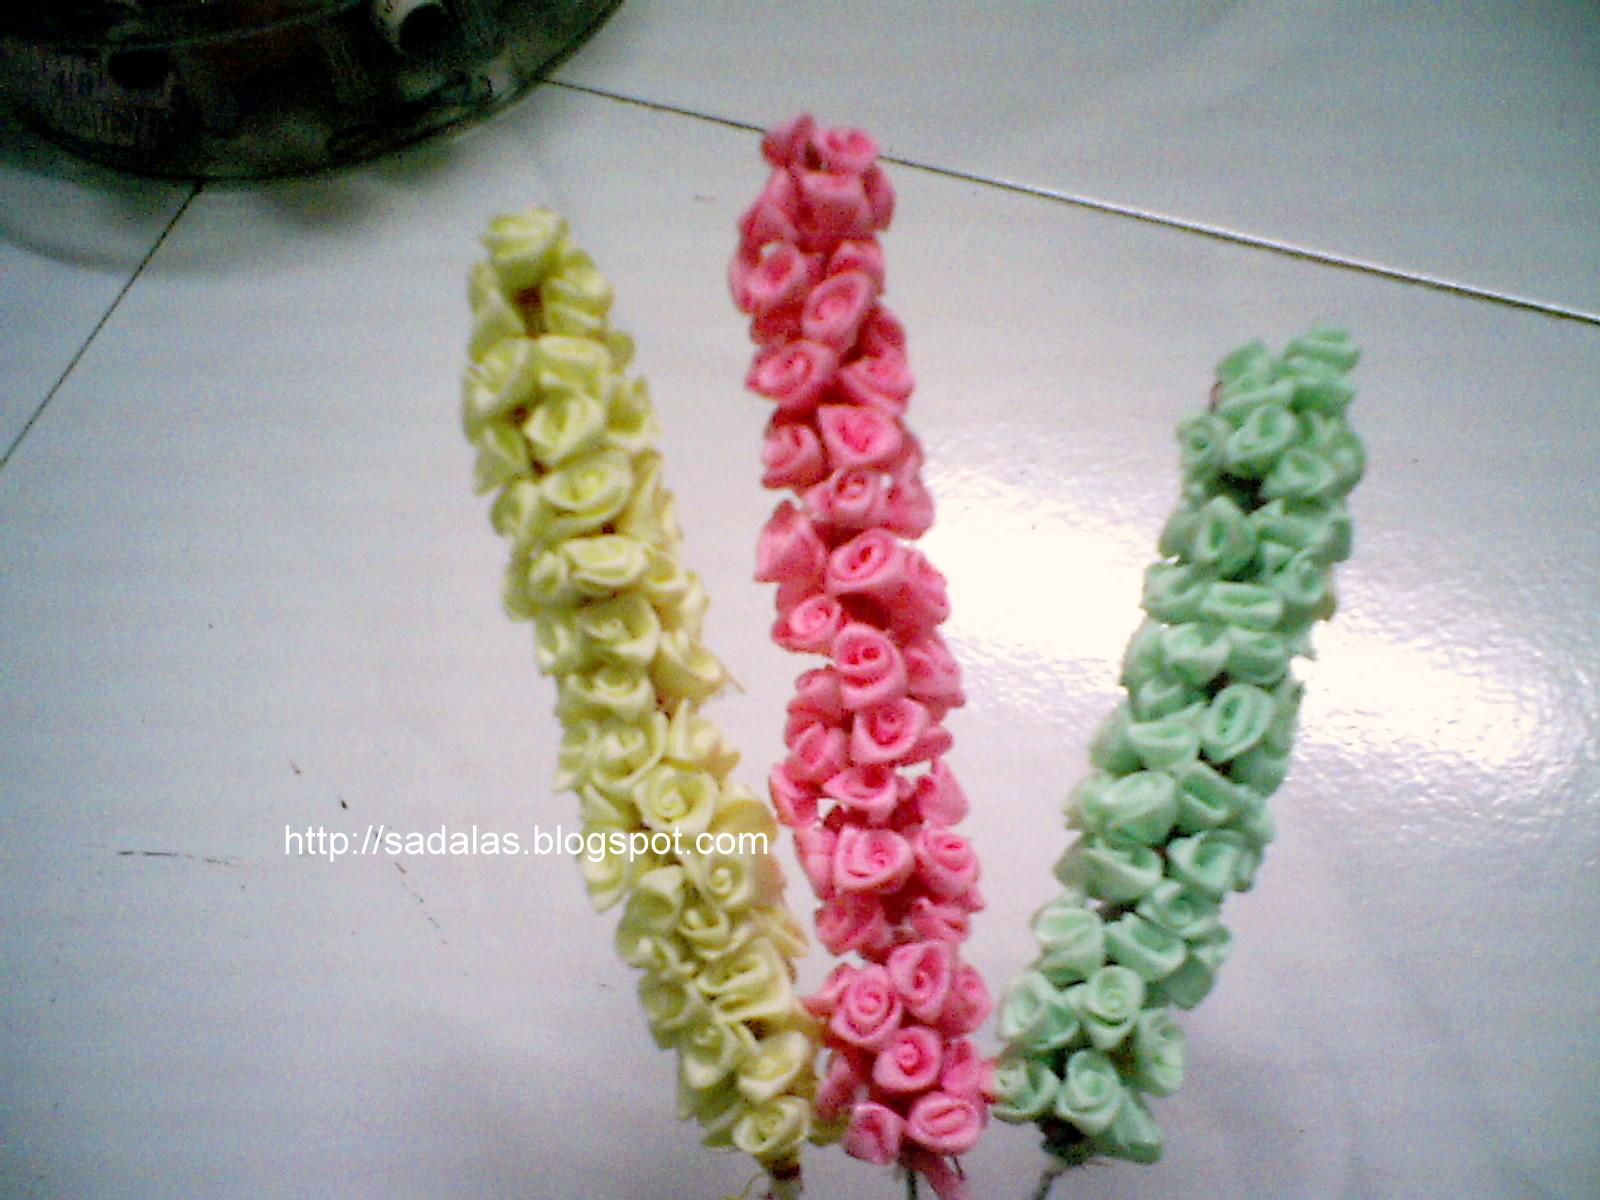 Sadalas Embroidery Satin Ribbon Flowers